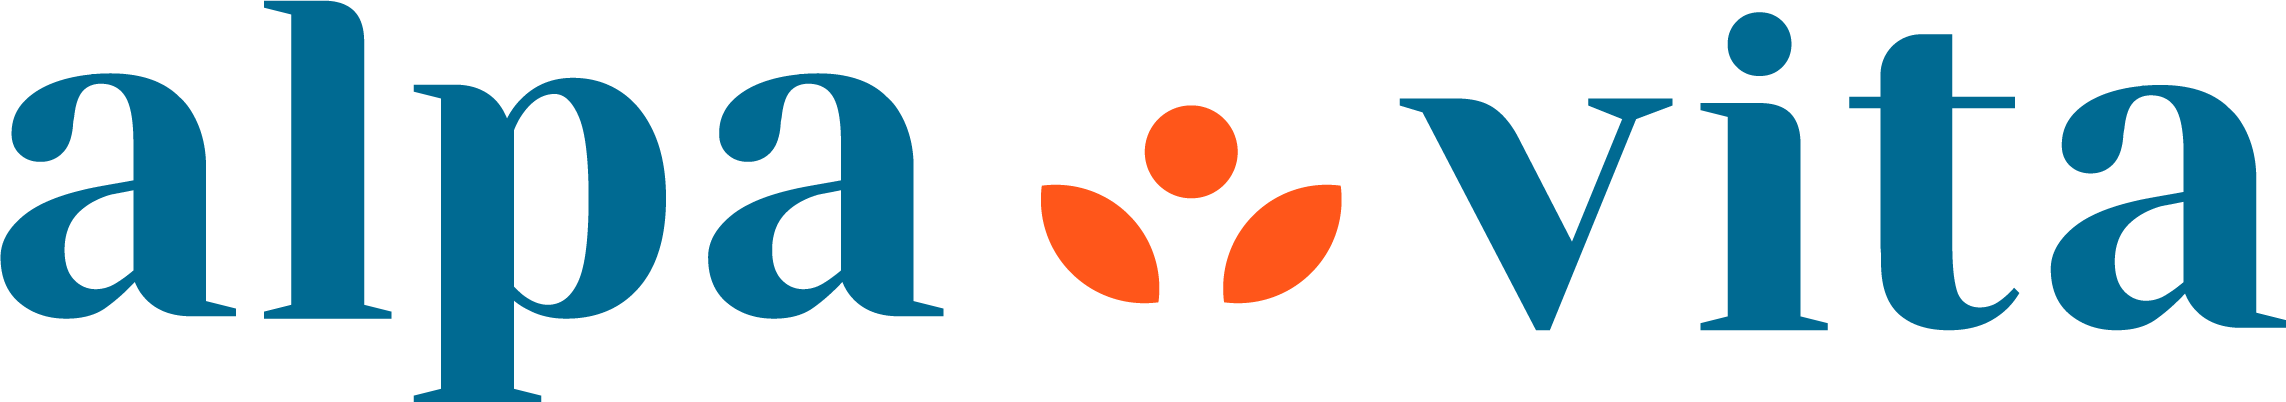 Alpavita GmbH